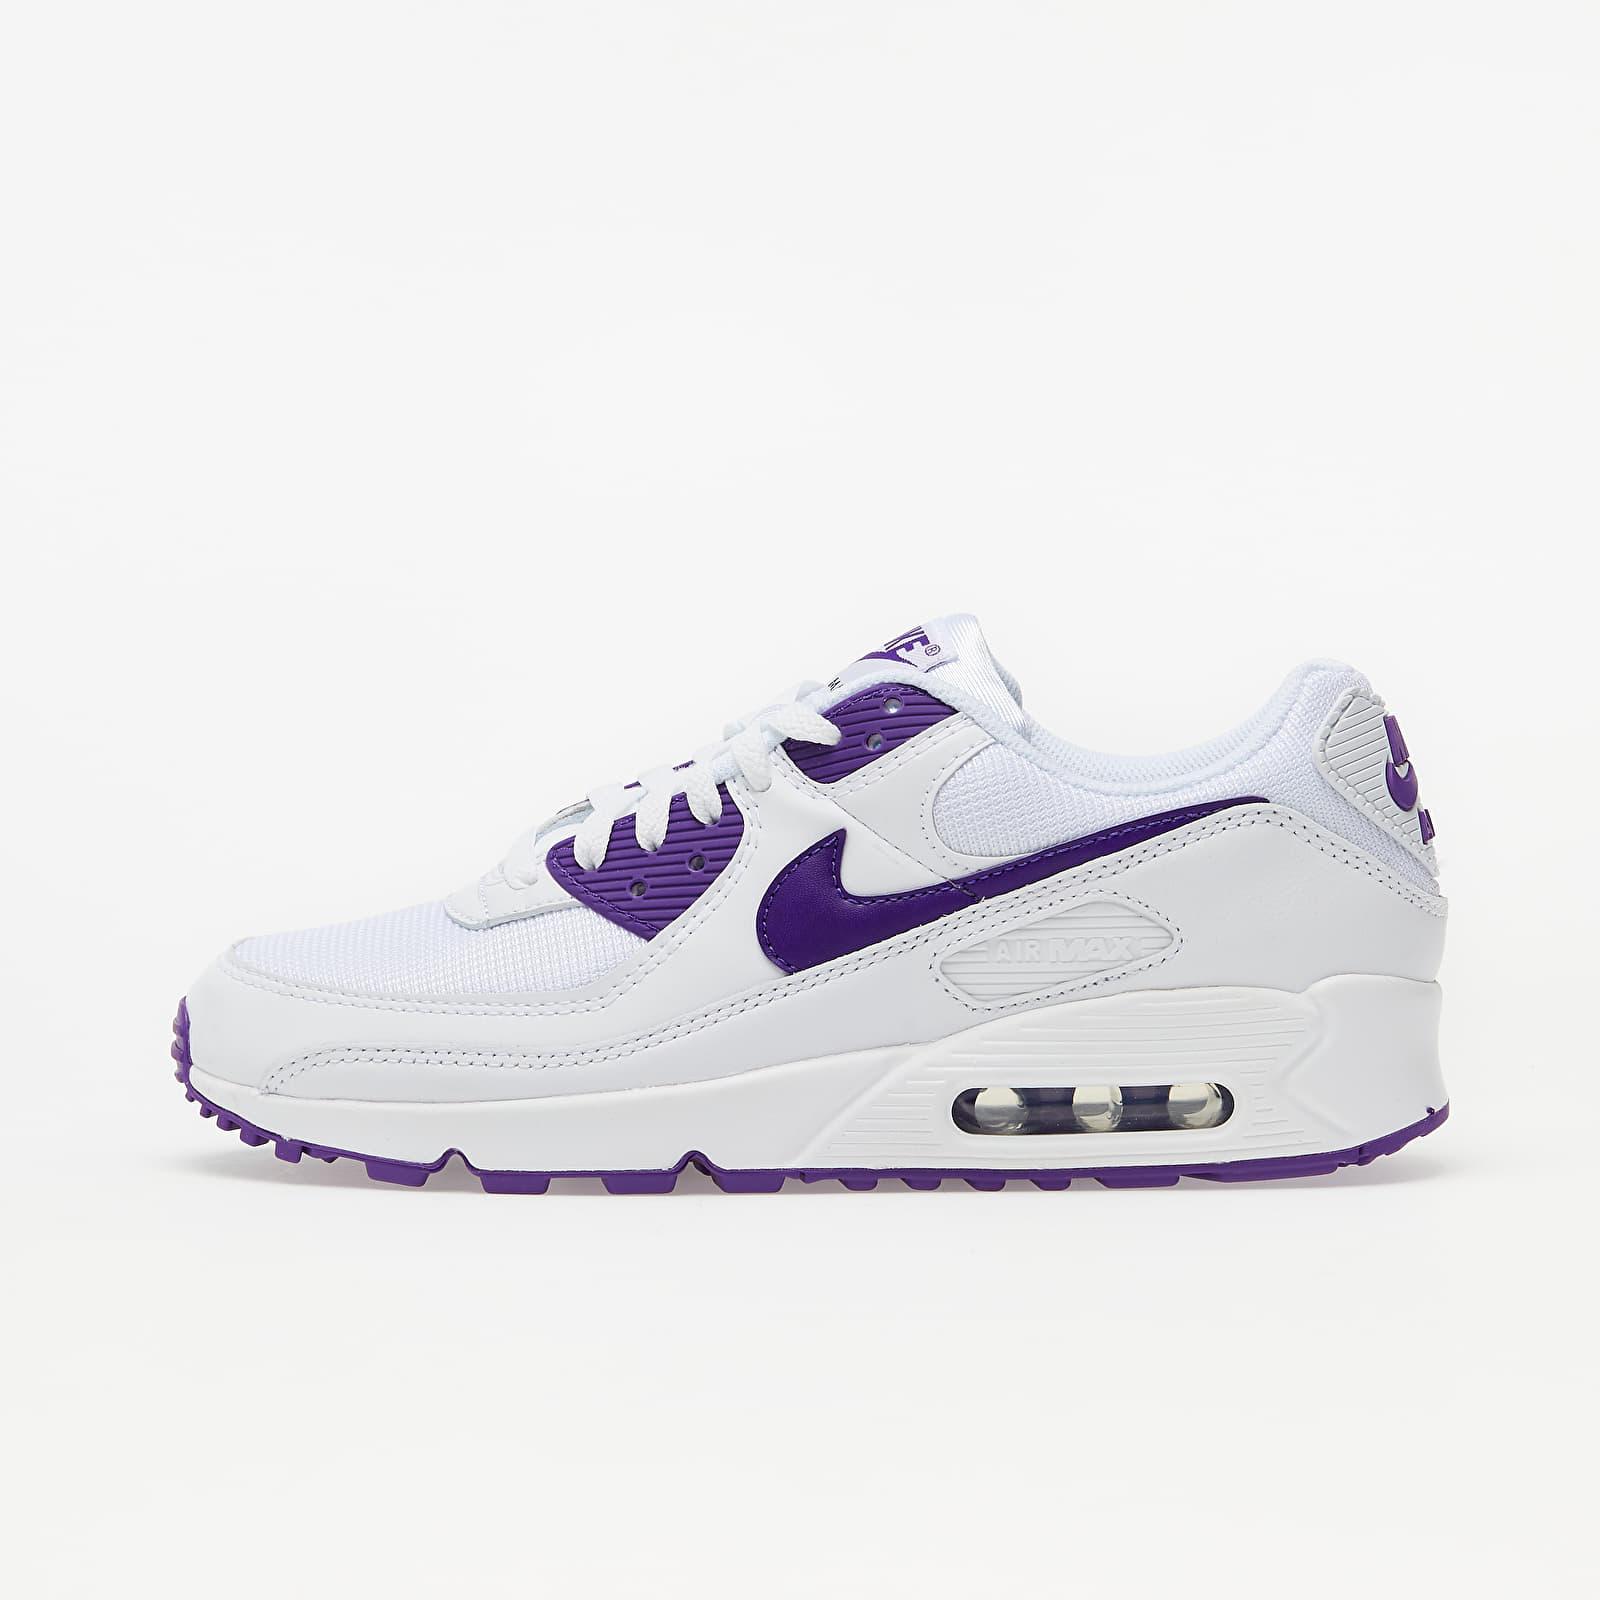 Nike Air Max 90 White/ Voltage Purple-Black | Footshop